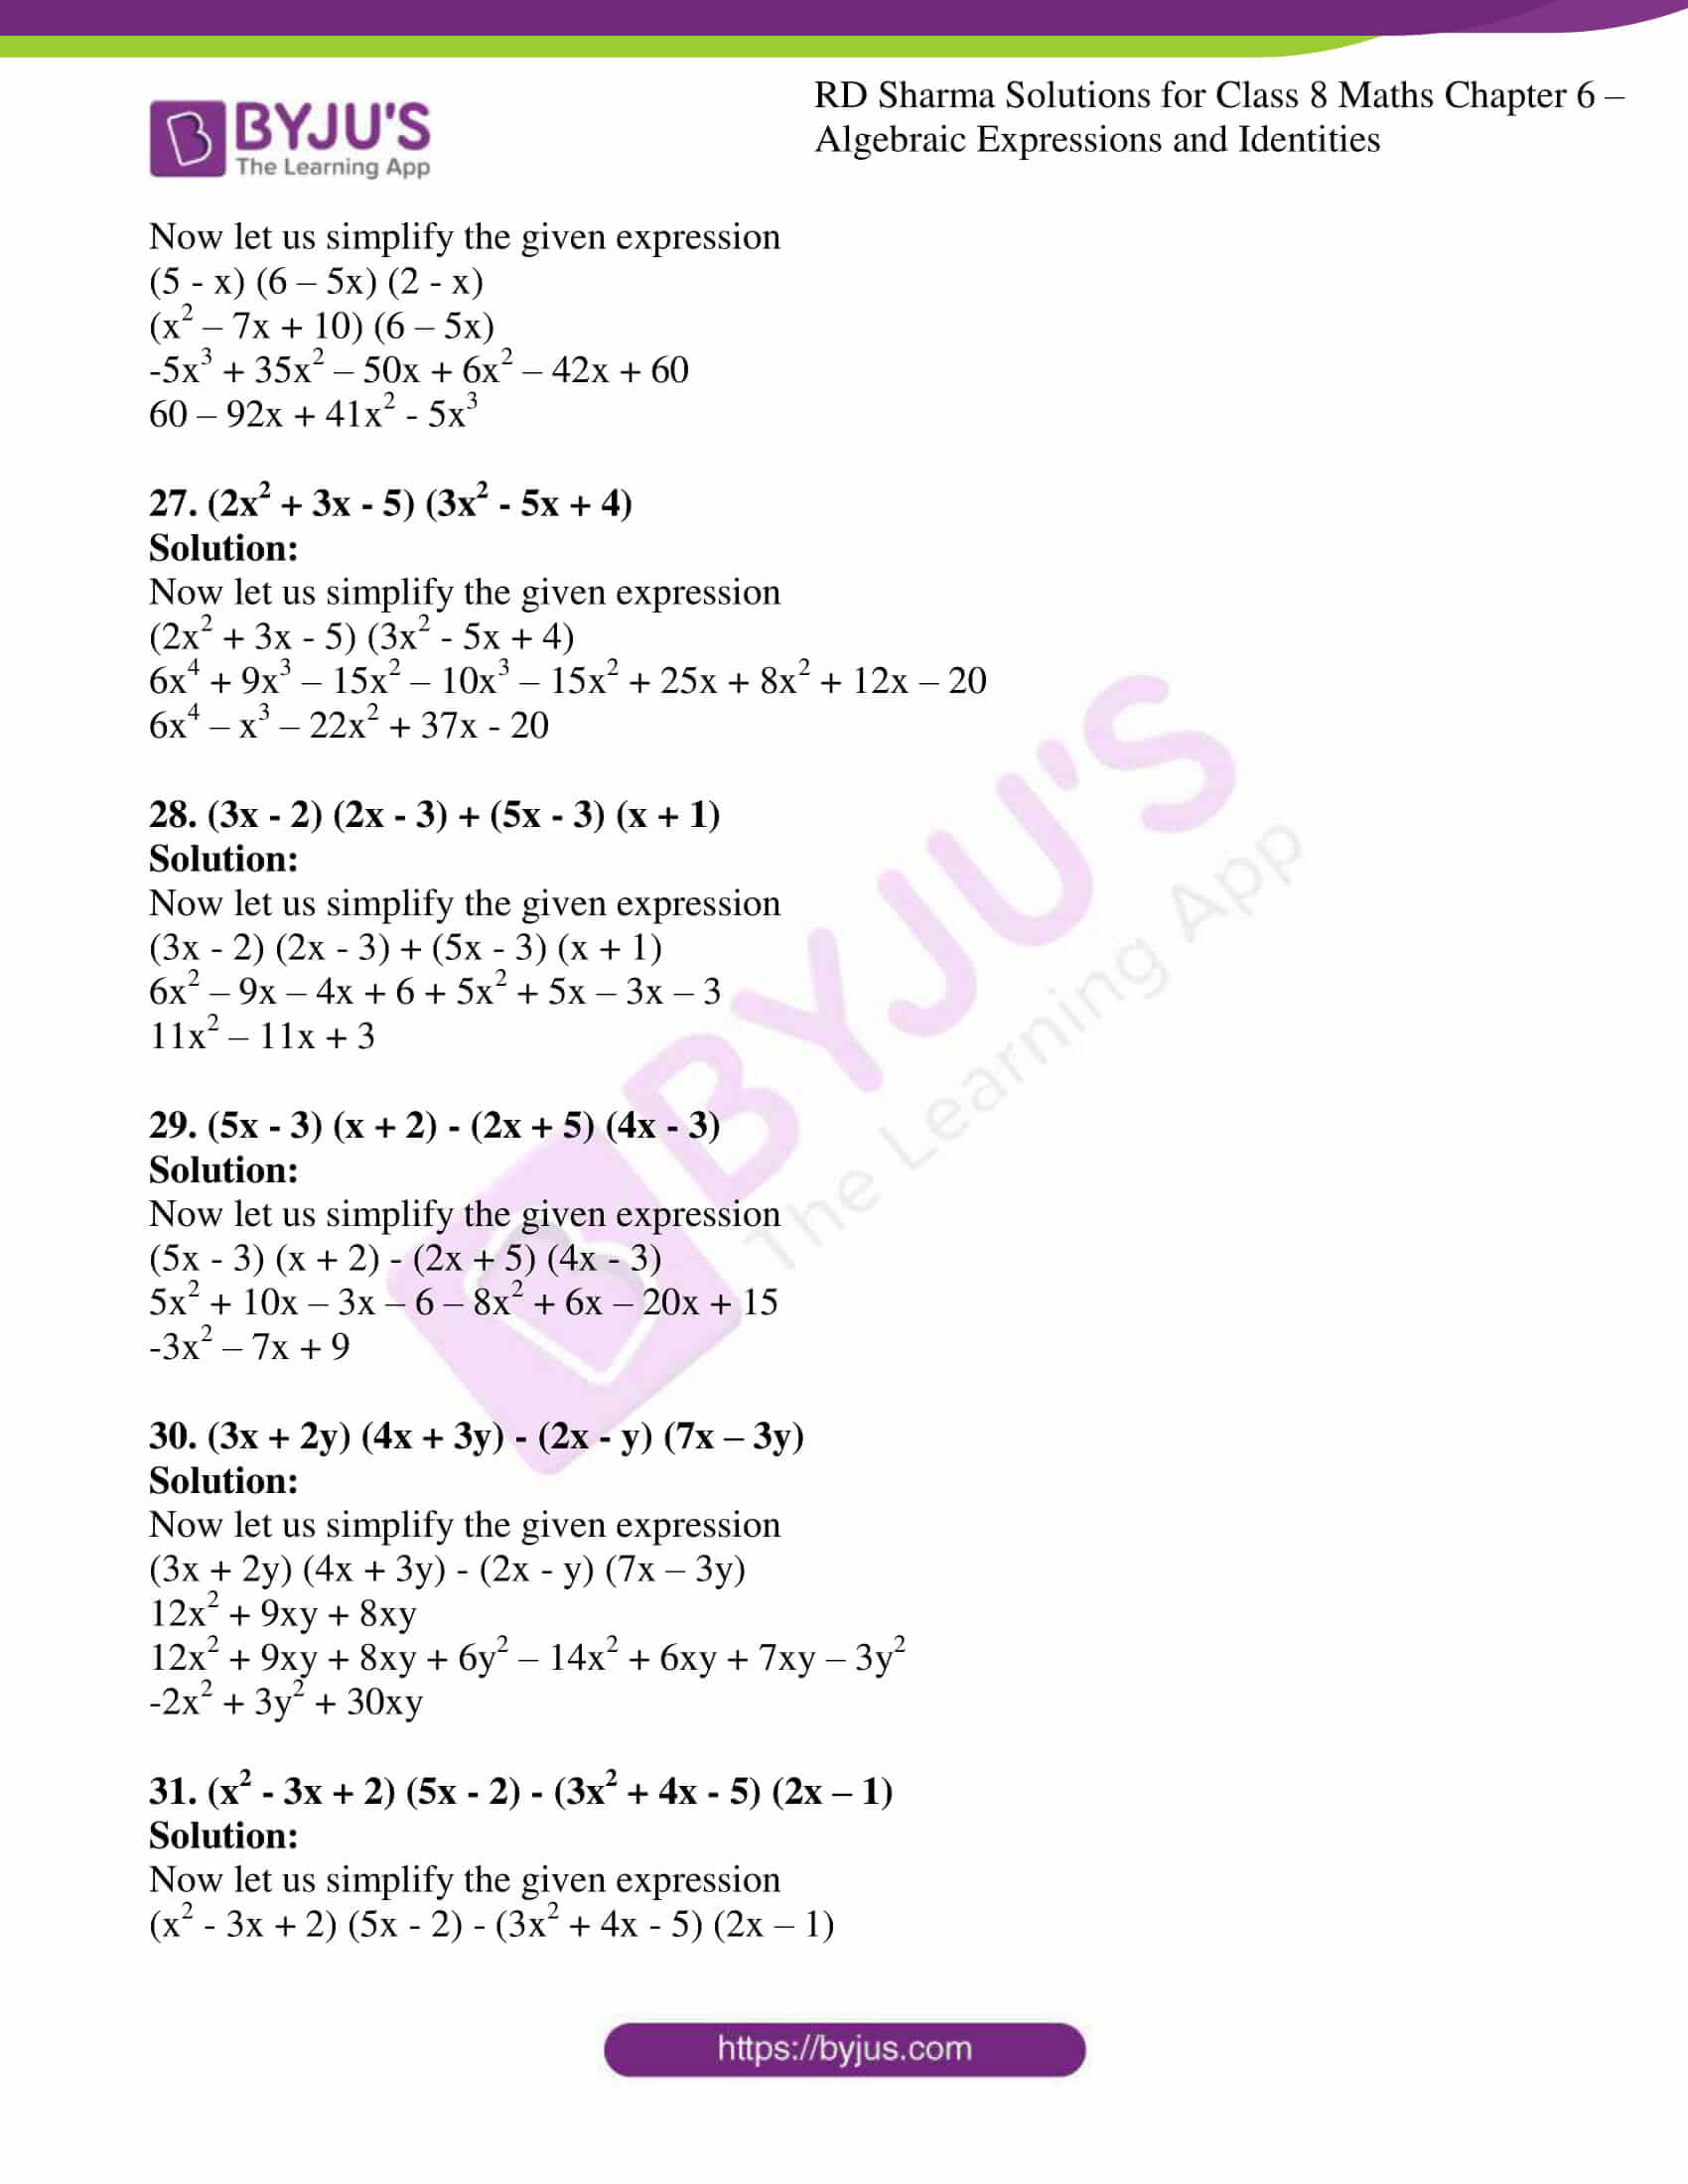 rd sharma class 8 maths chapter 6 exercise 5 7